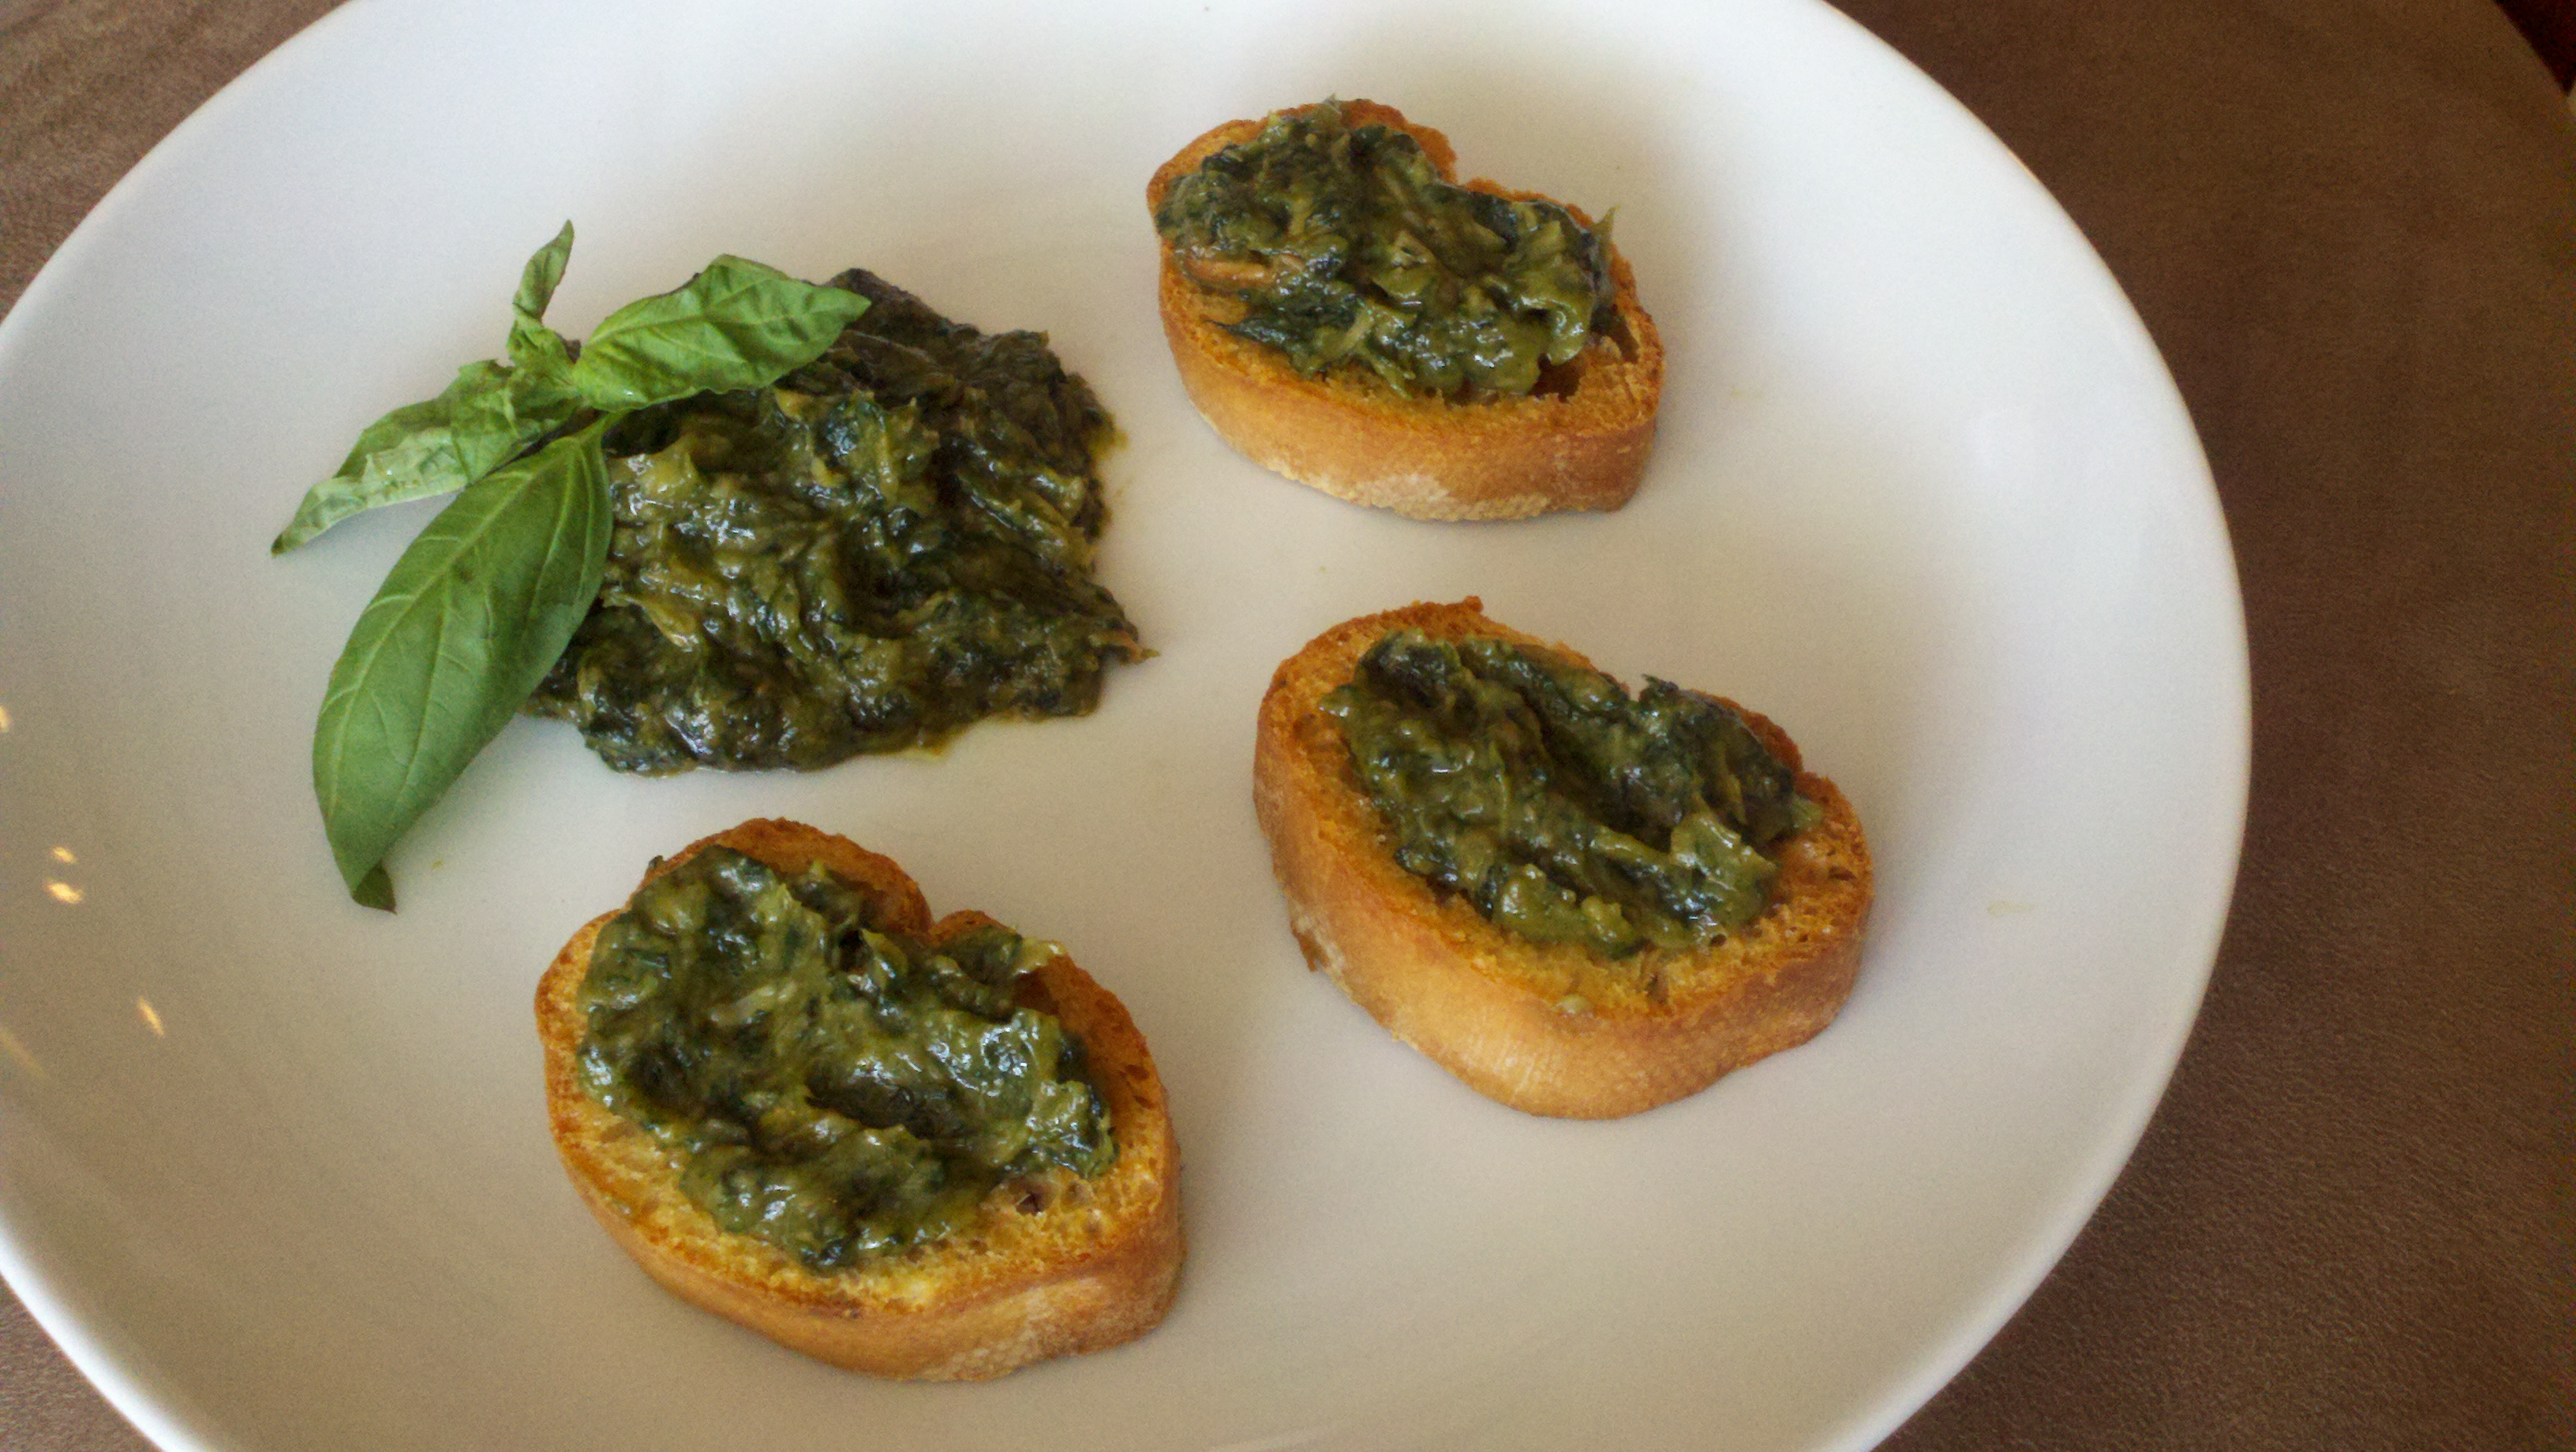 Basil and Roasted Garlic Spread   The Greek Vegan